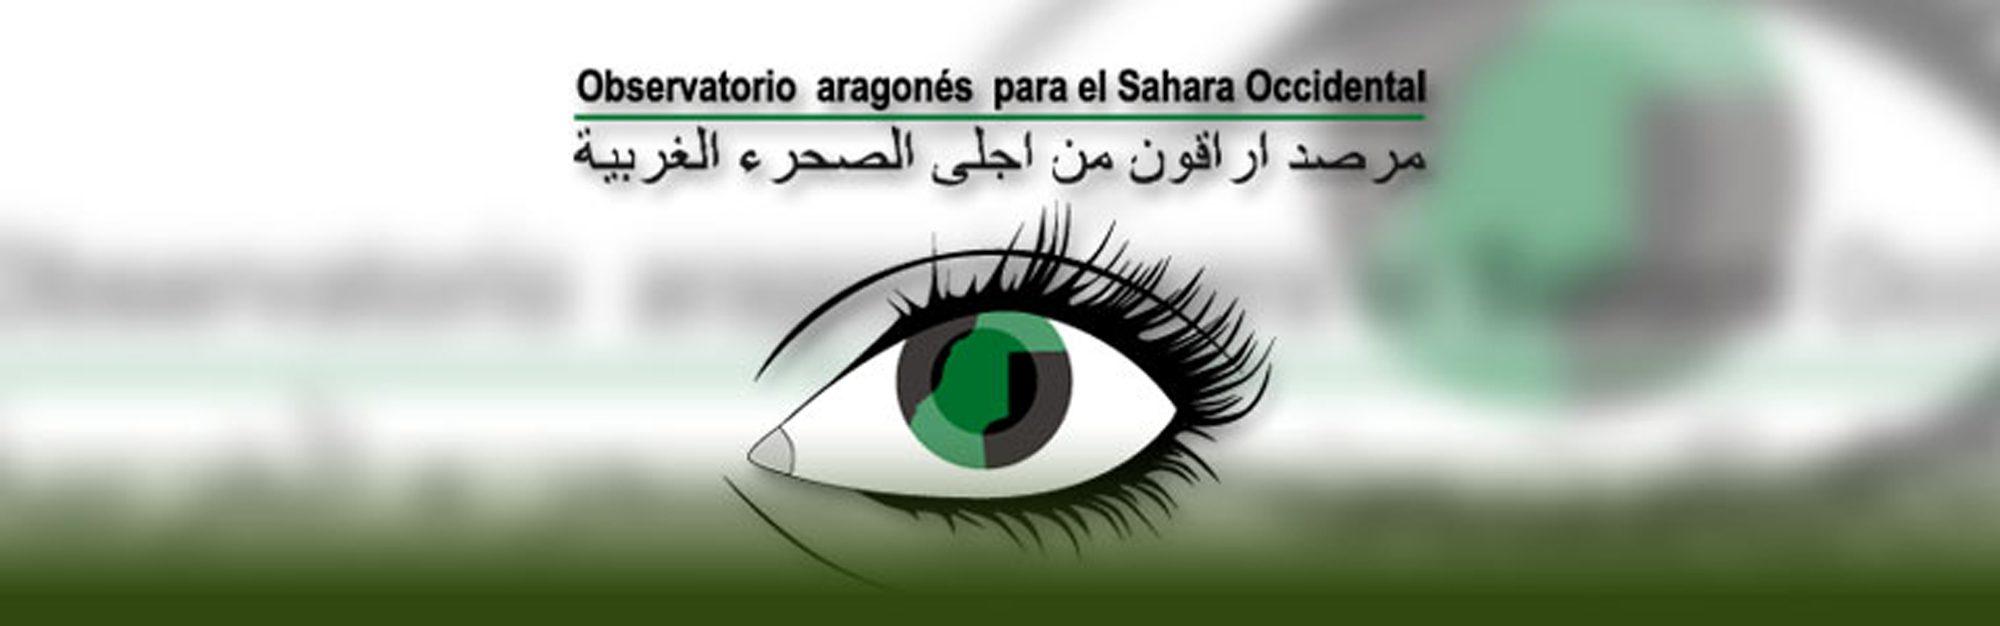 Observatorio Aragones para el Sahara Occidental